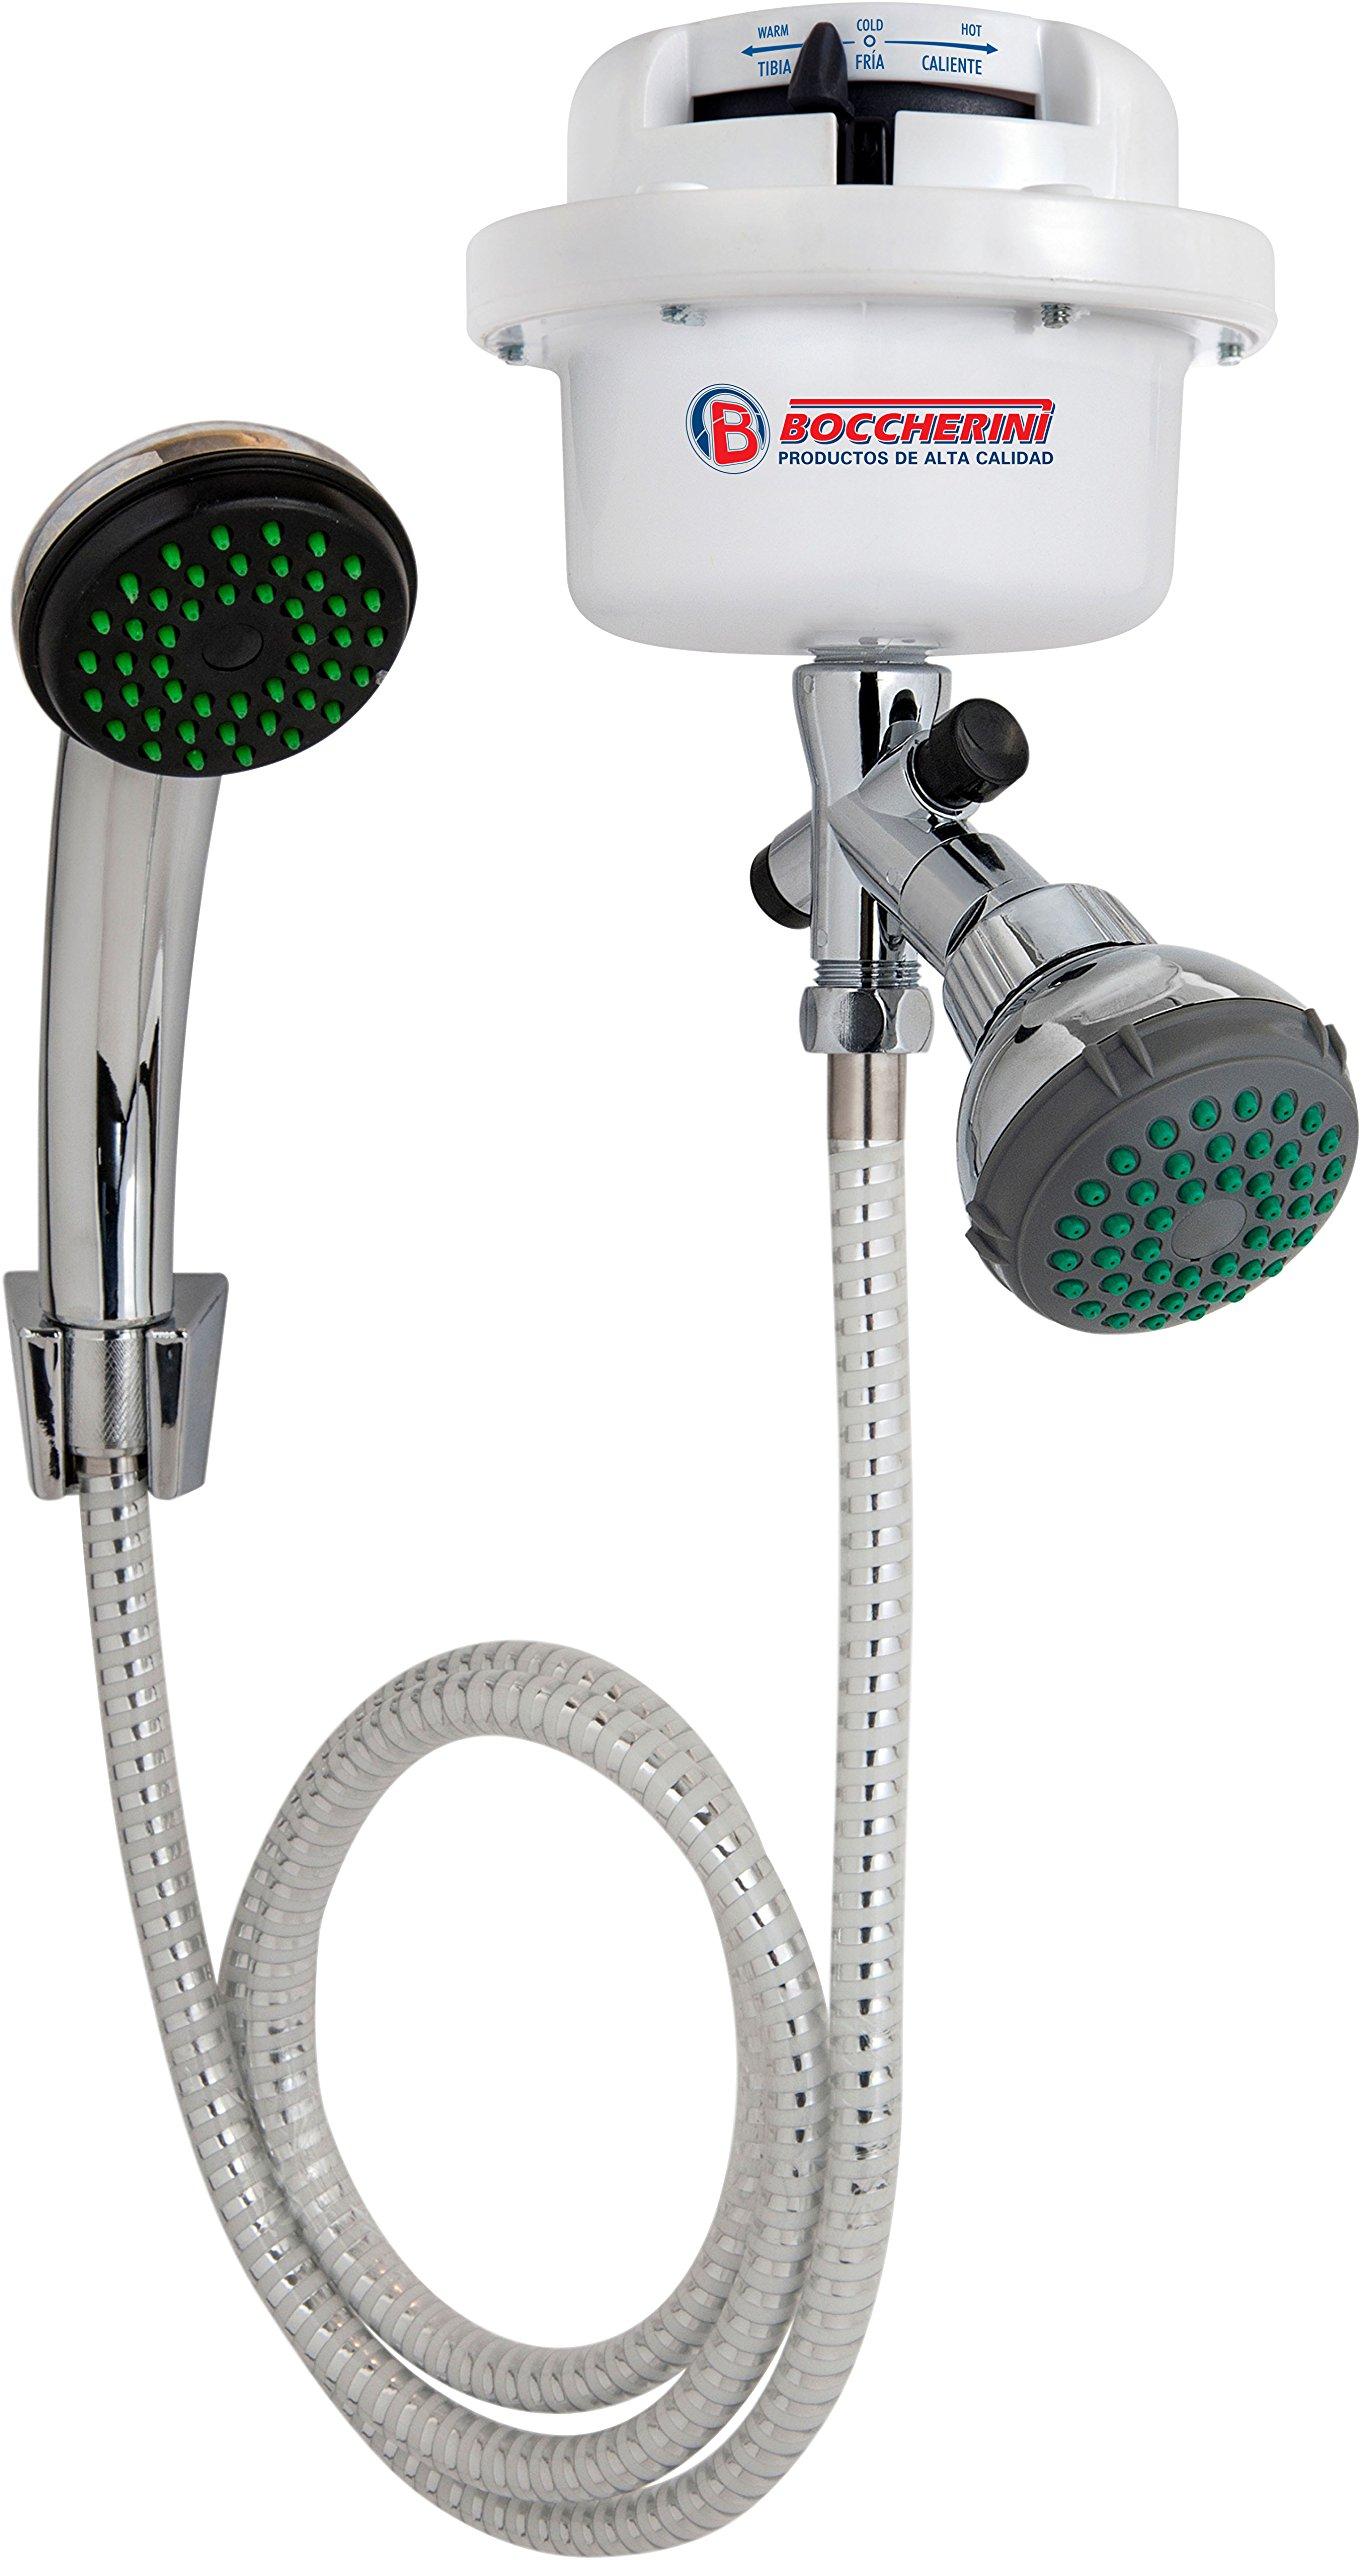 GARLAT Boccherini 110V Electric Instant Hot Water Shower Heater + Super Flexible Stainless Steel Hose + Rainfall Shower Head (Rainfall Shower Head)